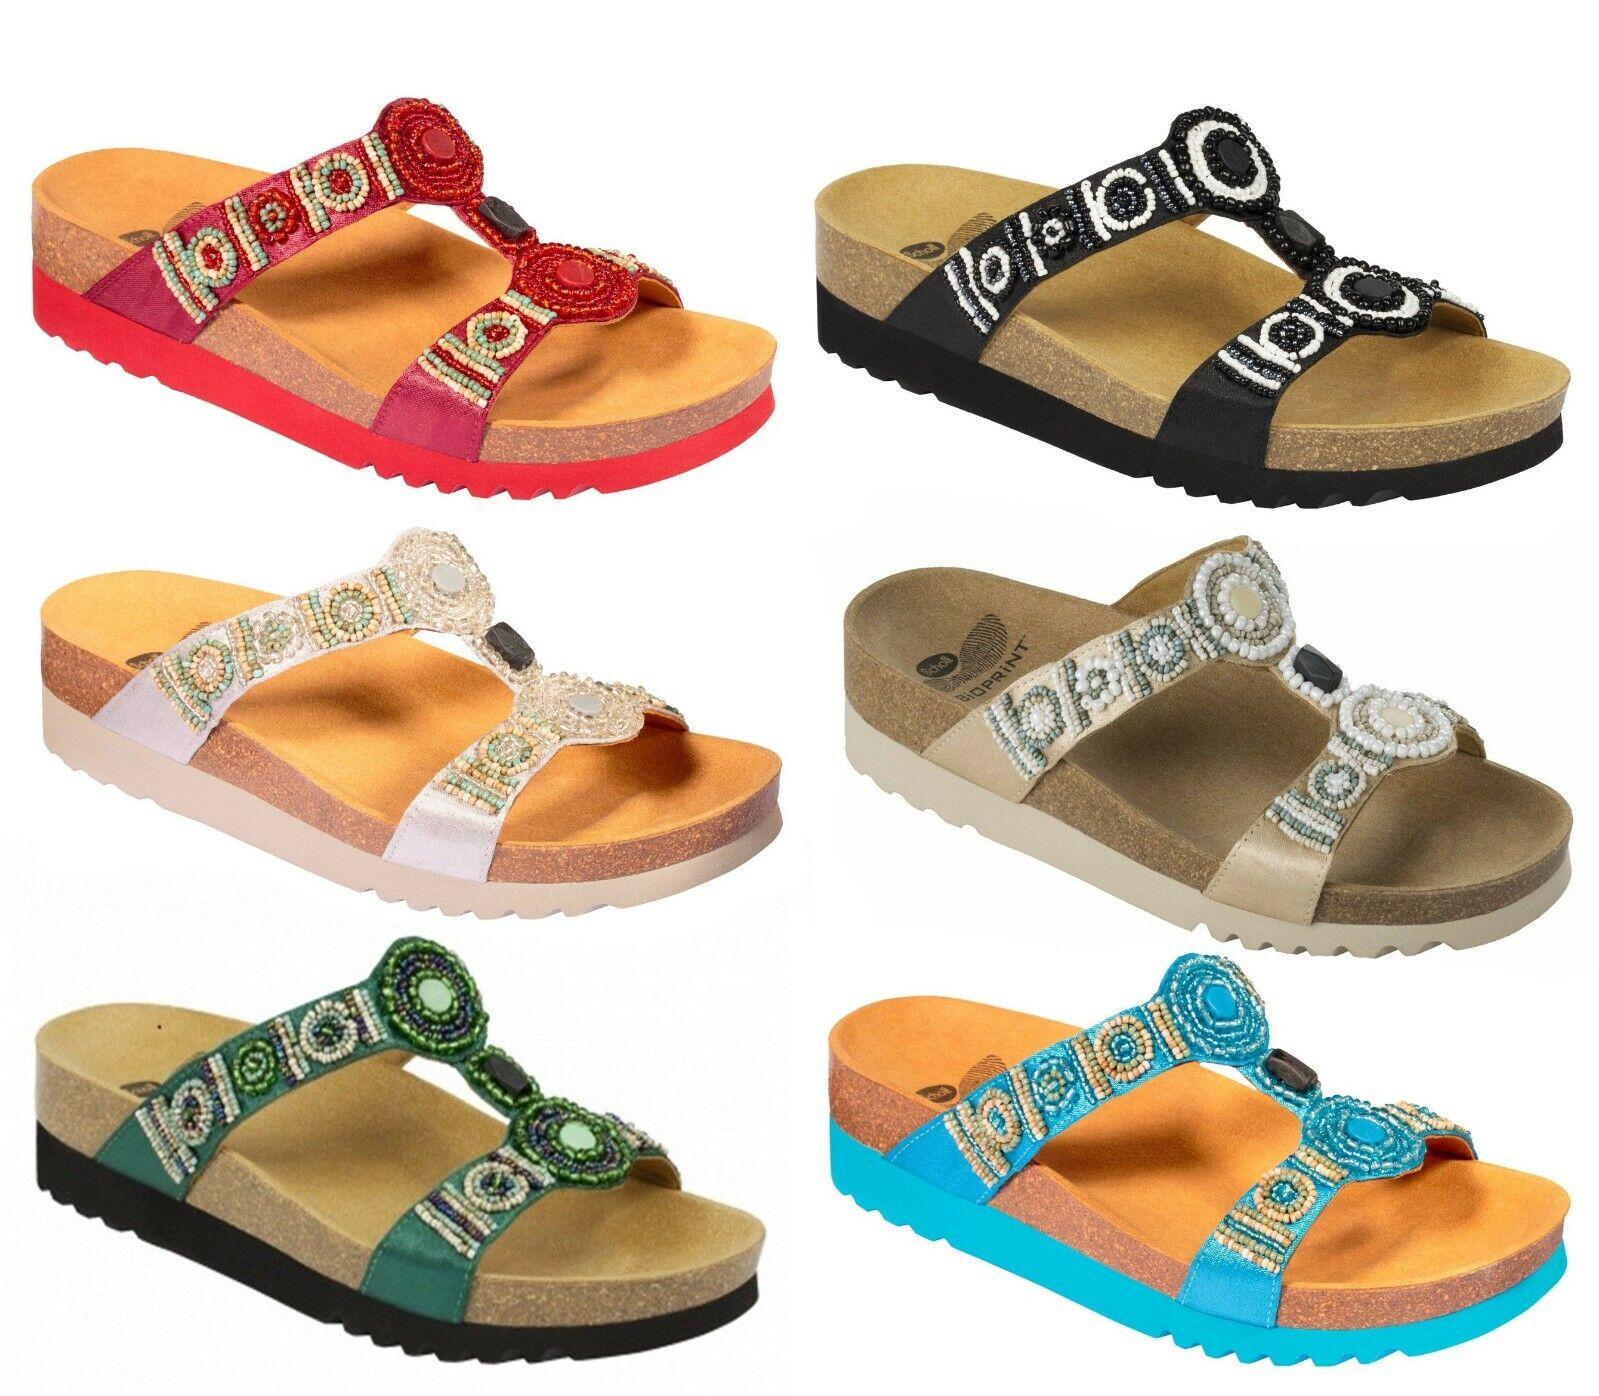 Scholl bioprint NEW Bogota Wedge Sandals Slippers Clogs Slippers Women Wedge